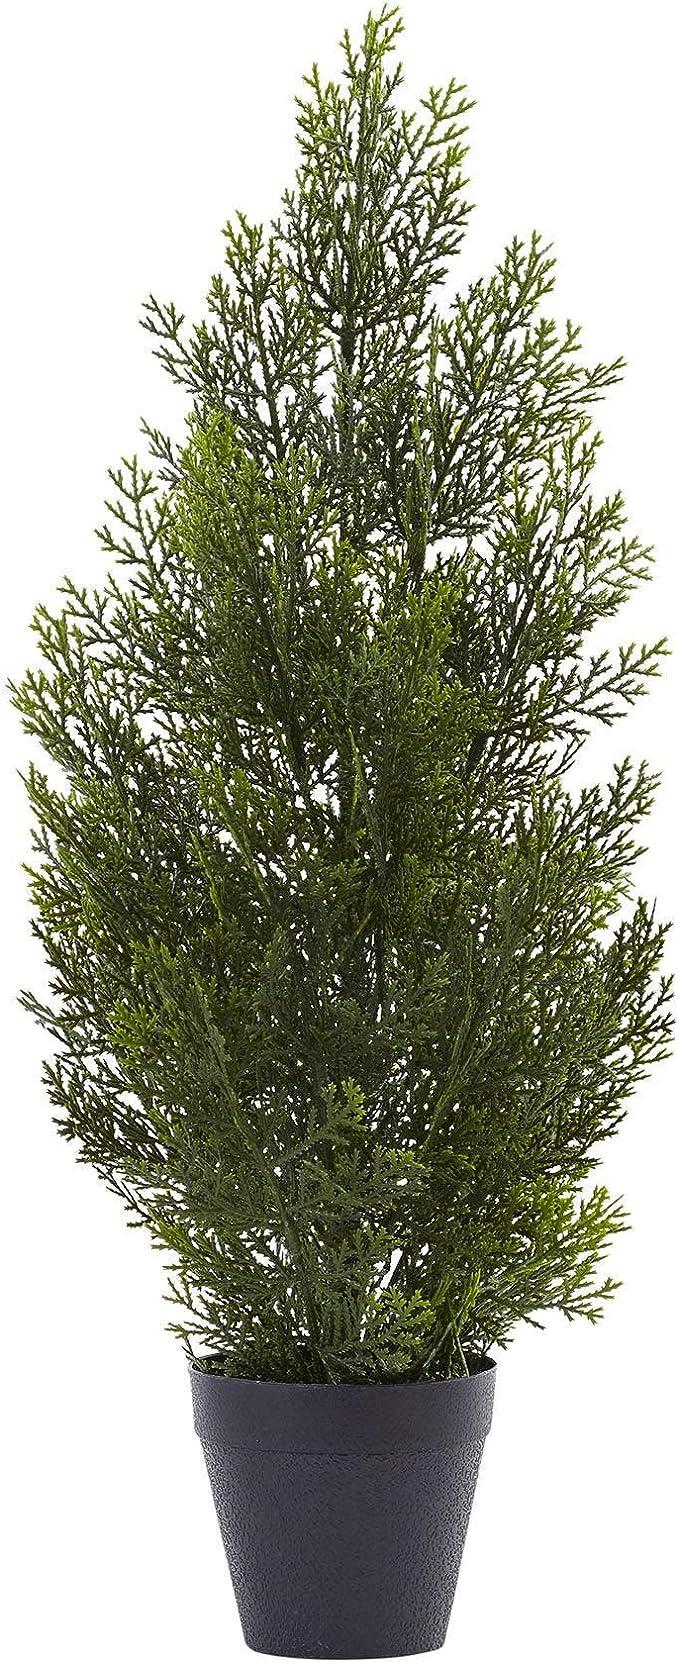 Casi Natural Mini Cedro Pino árbol: Amazon.es: Hogar